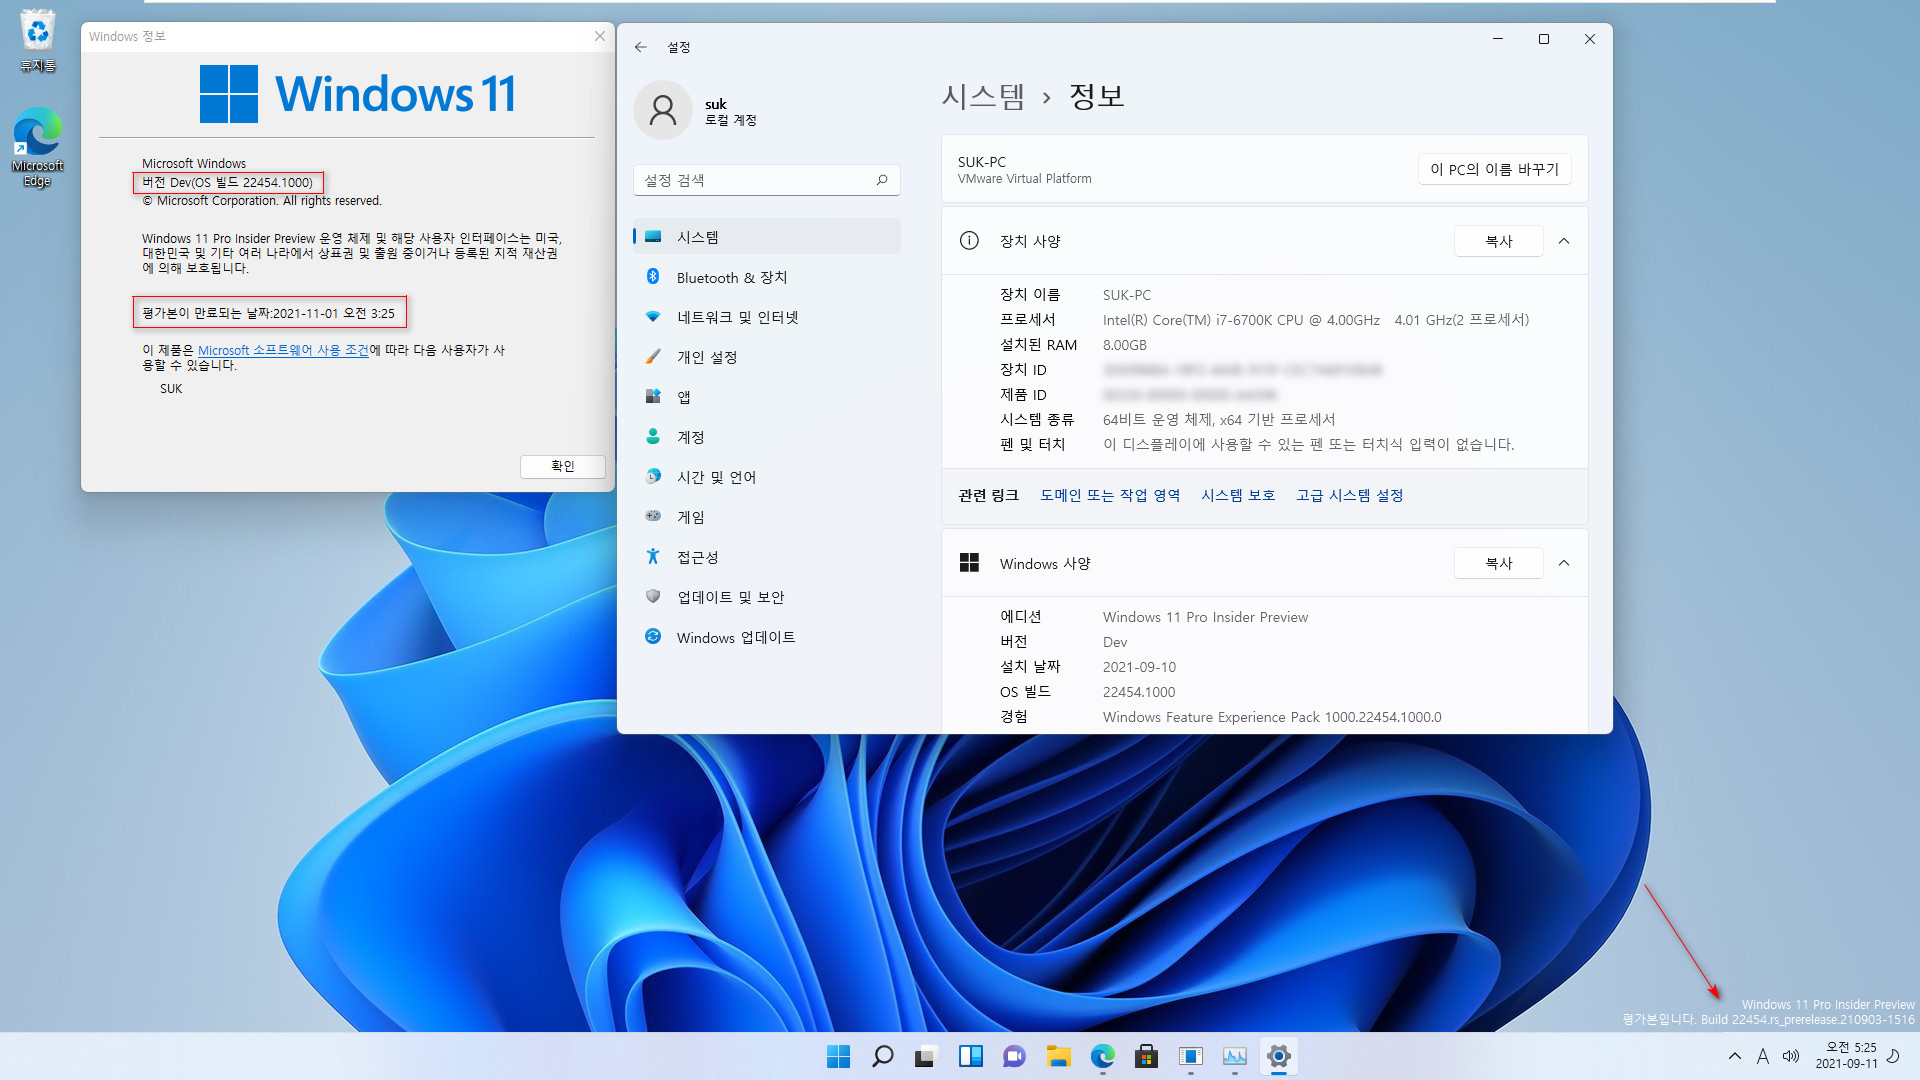 Windows 11 인사이더 프리뷰 - 버전 Dev (OS 빌드 22454.1000)  - 개발자 채널 - 내년 2022년 10월쯤 정식 출시하려고 개발이 시작된 빌드들 중에 하나 입니다. 평가본 워터마크와 만료 날짜가 있습니다 2021-09-11_052529.jpg